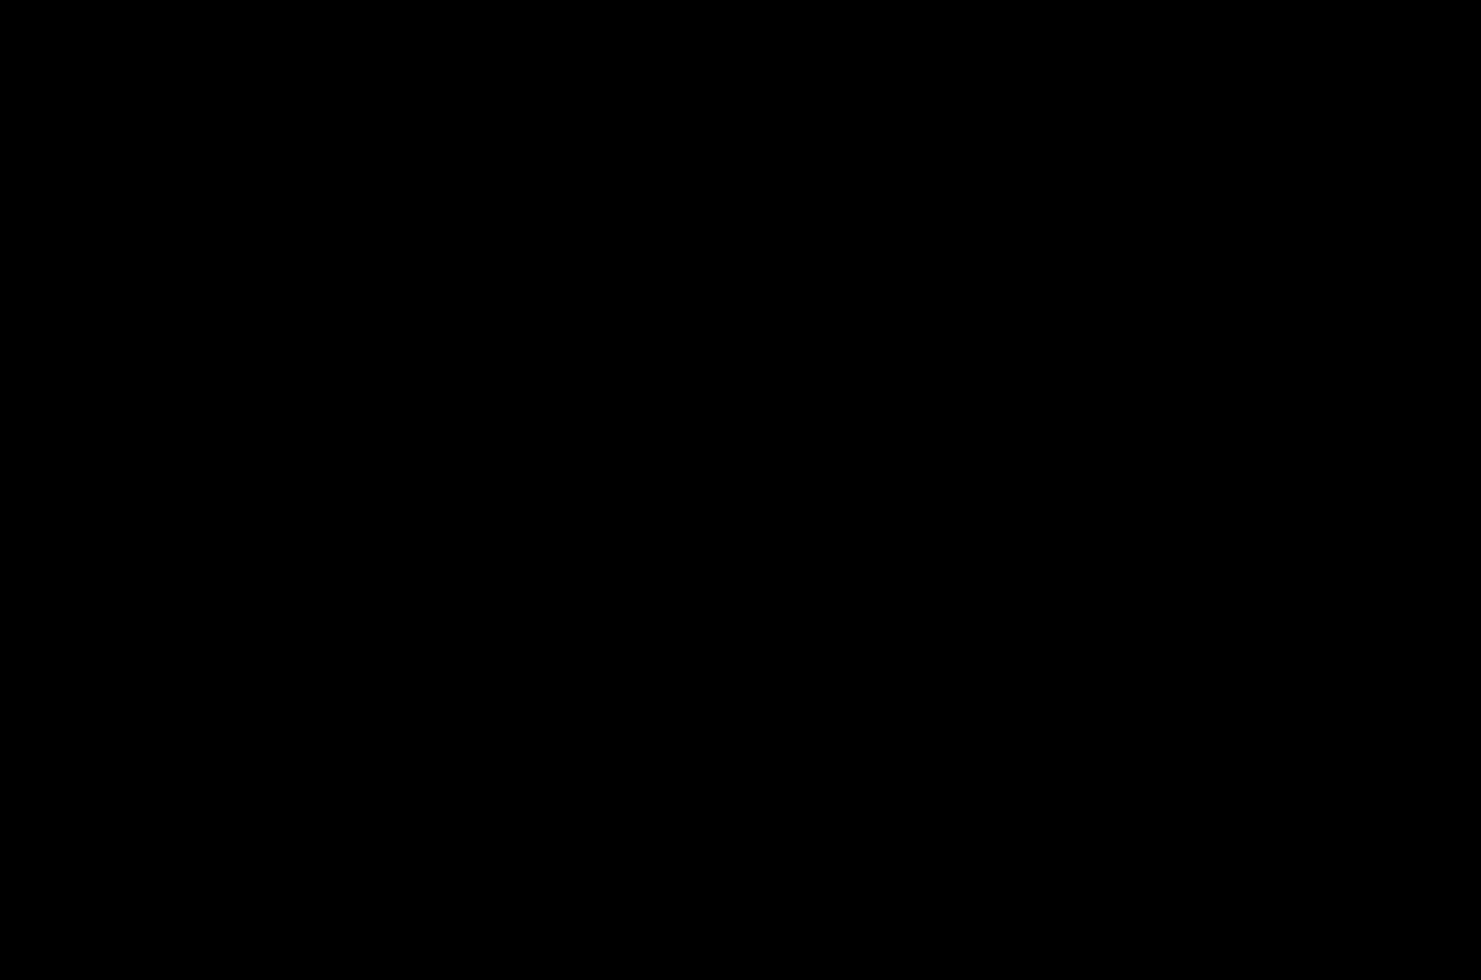 Berglogos png